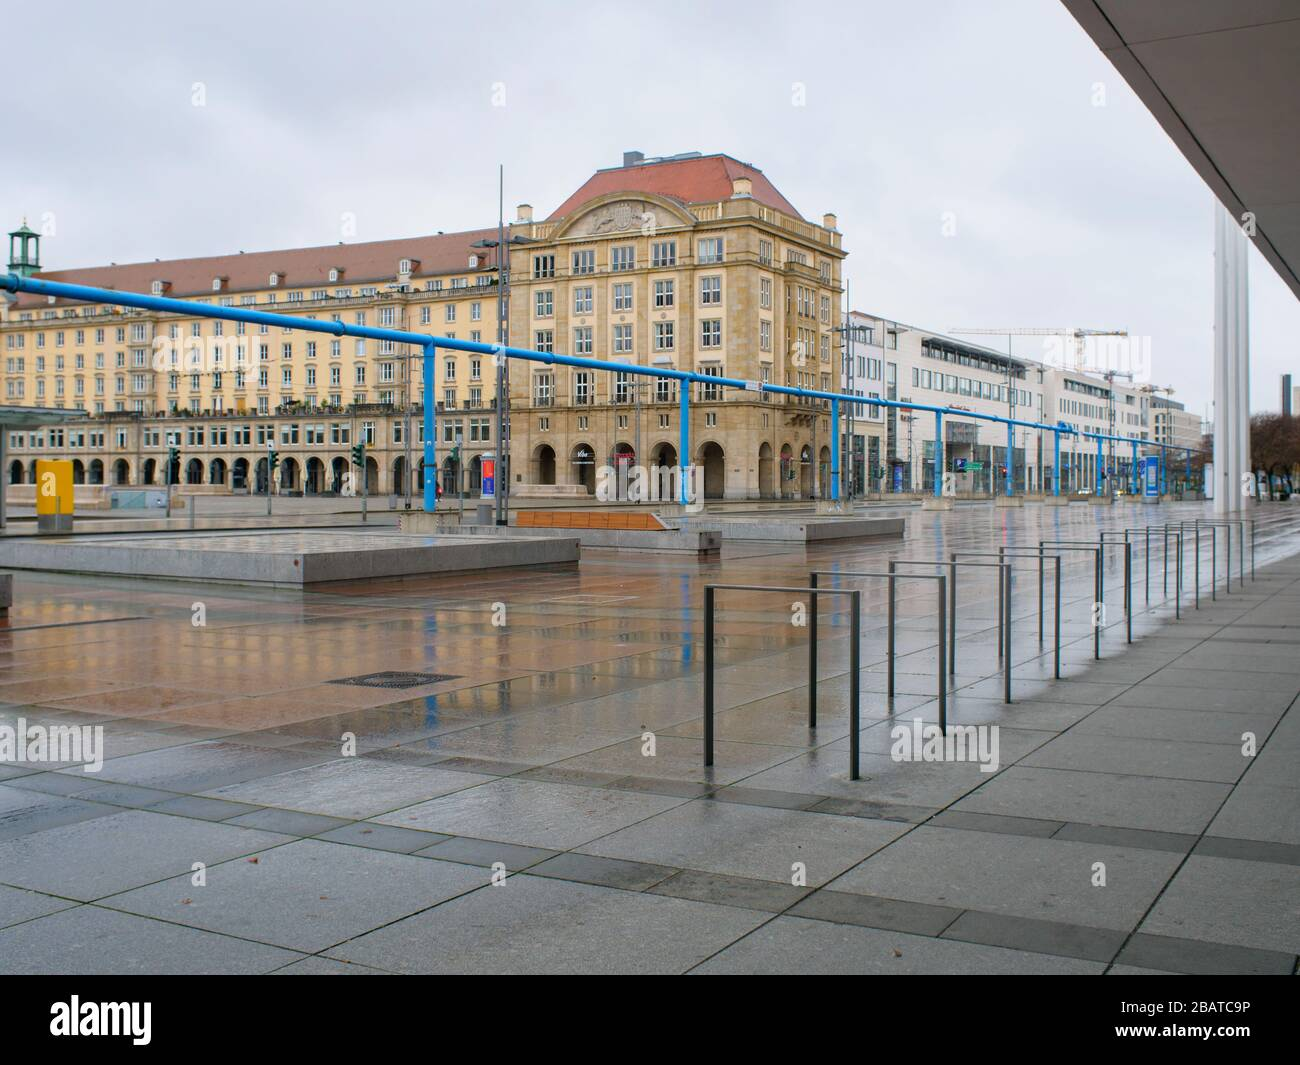 Platz vor dem Kulturpalast en Dresden während Coronavirus Lockdown Wilsdruffer Straße leere Bänke und leere Haltestelle im Regen Foto de stock